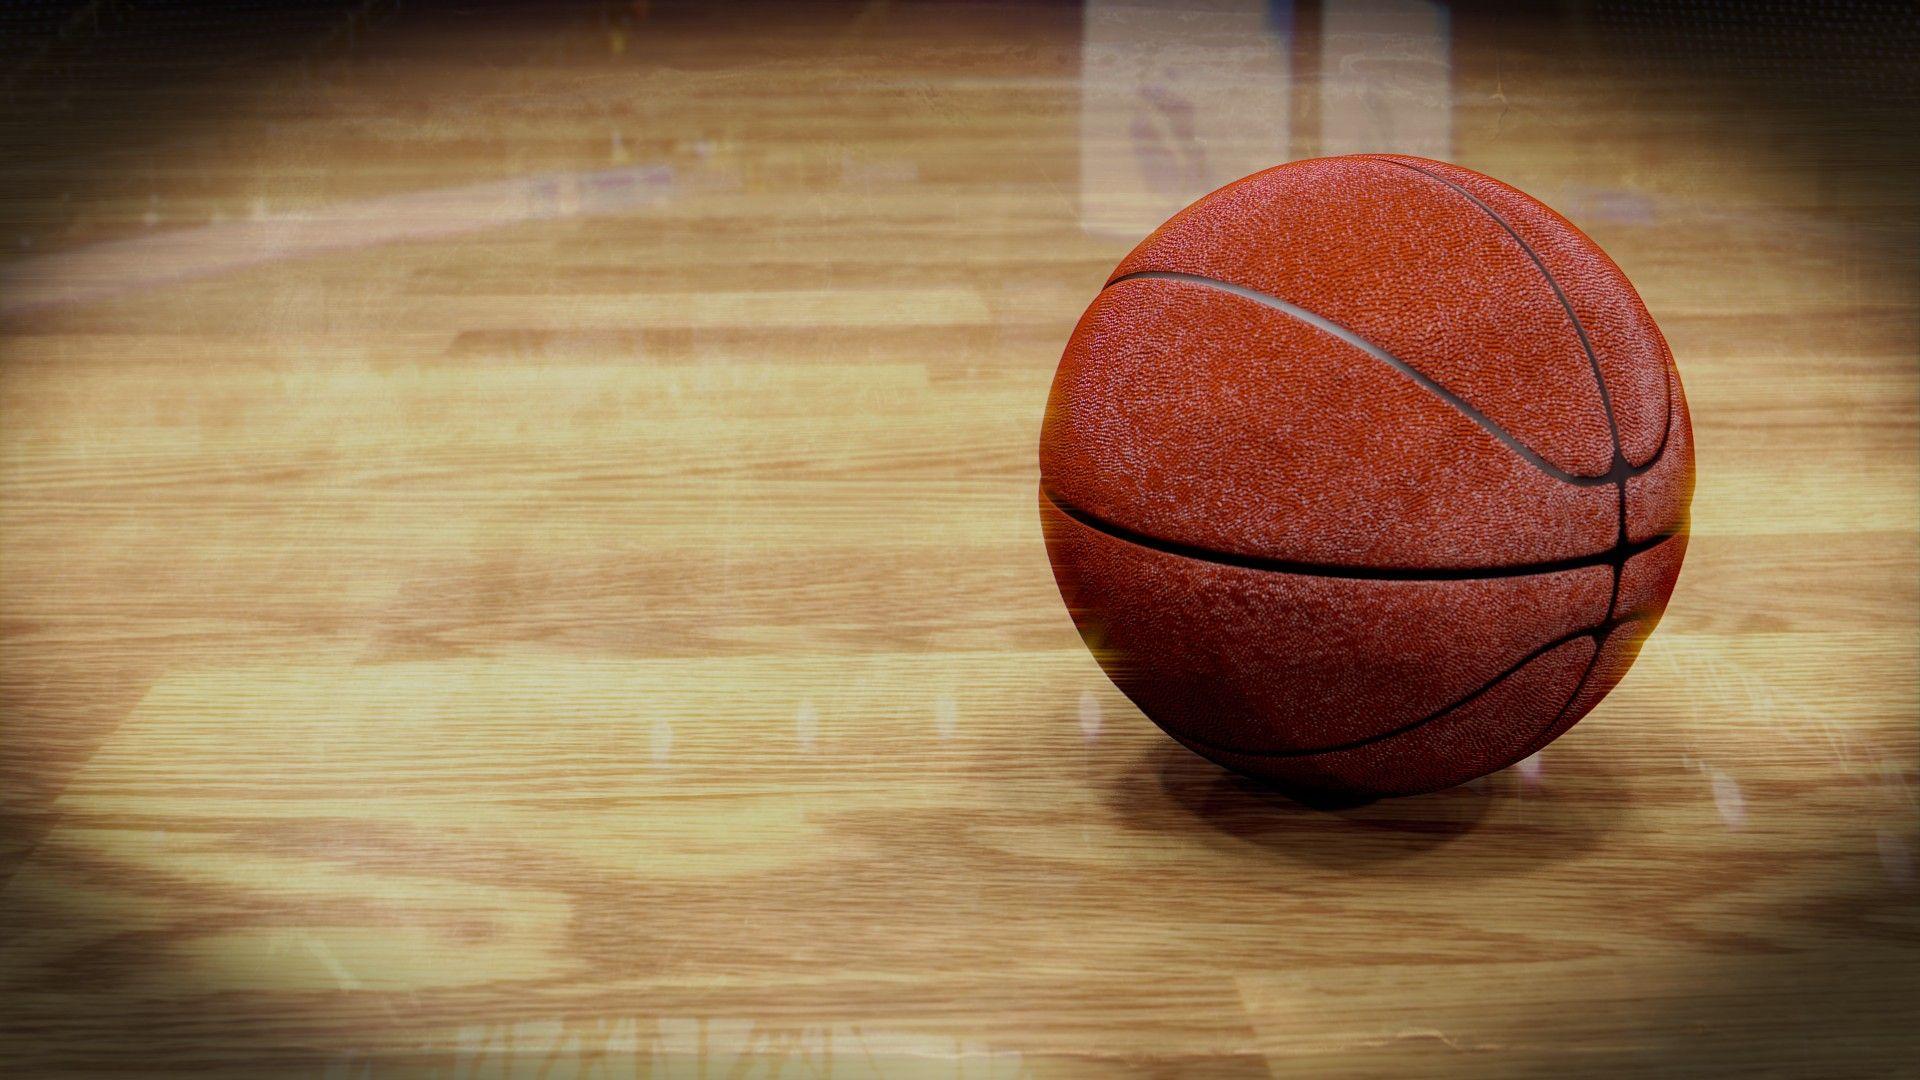 Basketball Wallpaper Best Basketball Wallpapers 2020 Basketball Wallpaper Cool Basketball Wallpapers Basketball Background